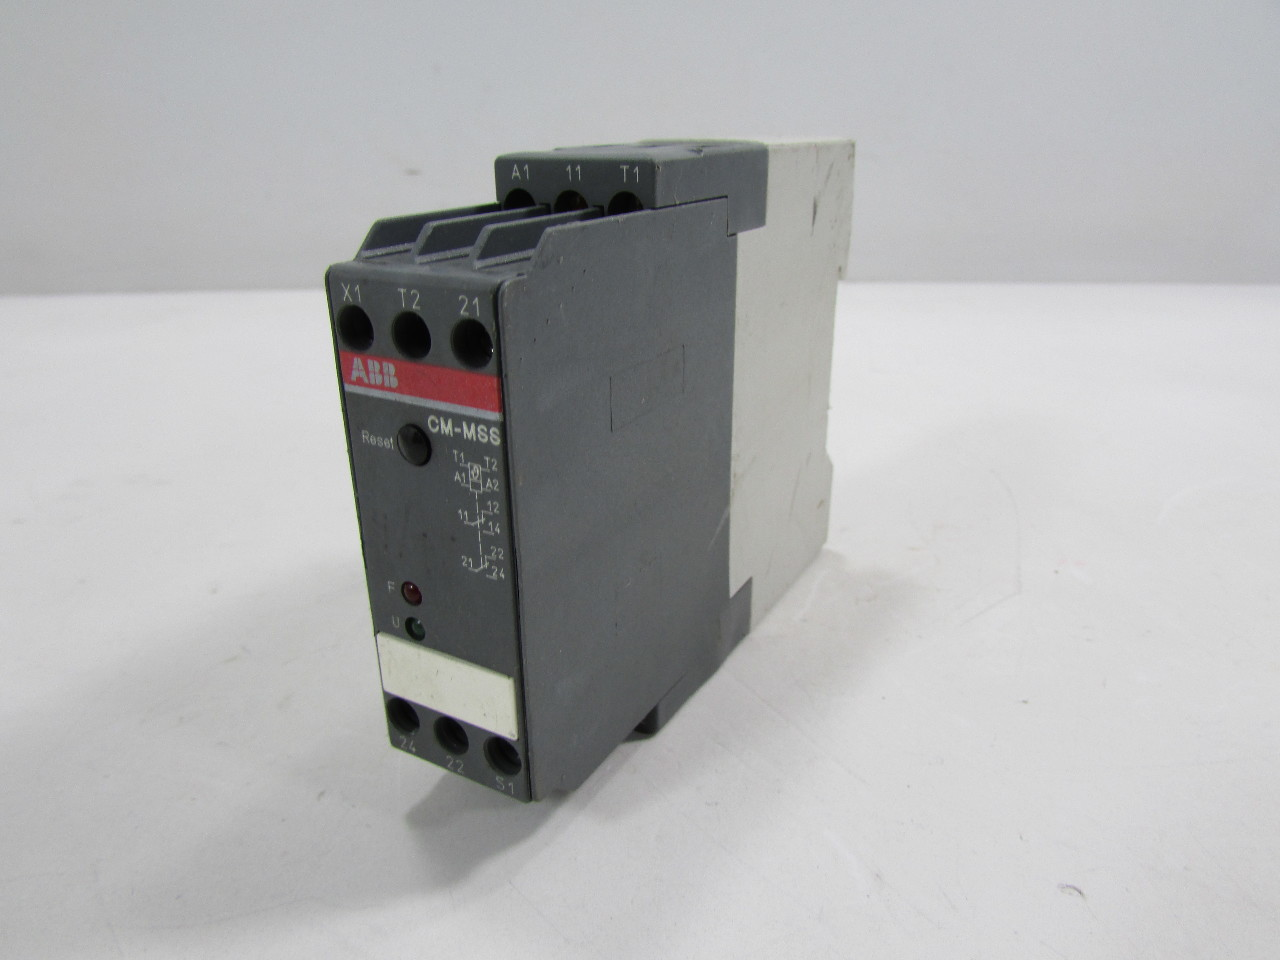 Abb Cm Mss 1svr430720r0300 Motor Protection Monitoring Relay Ebay